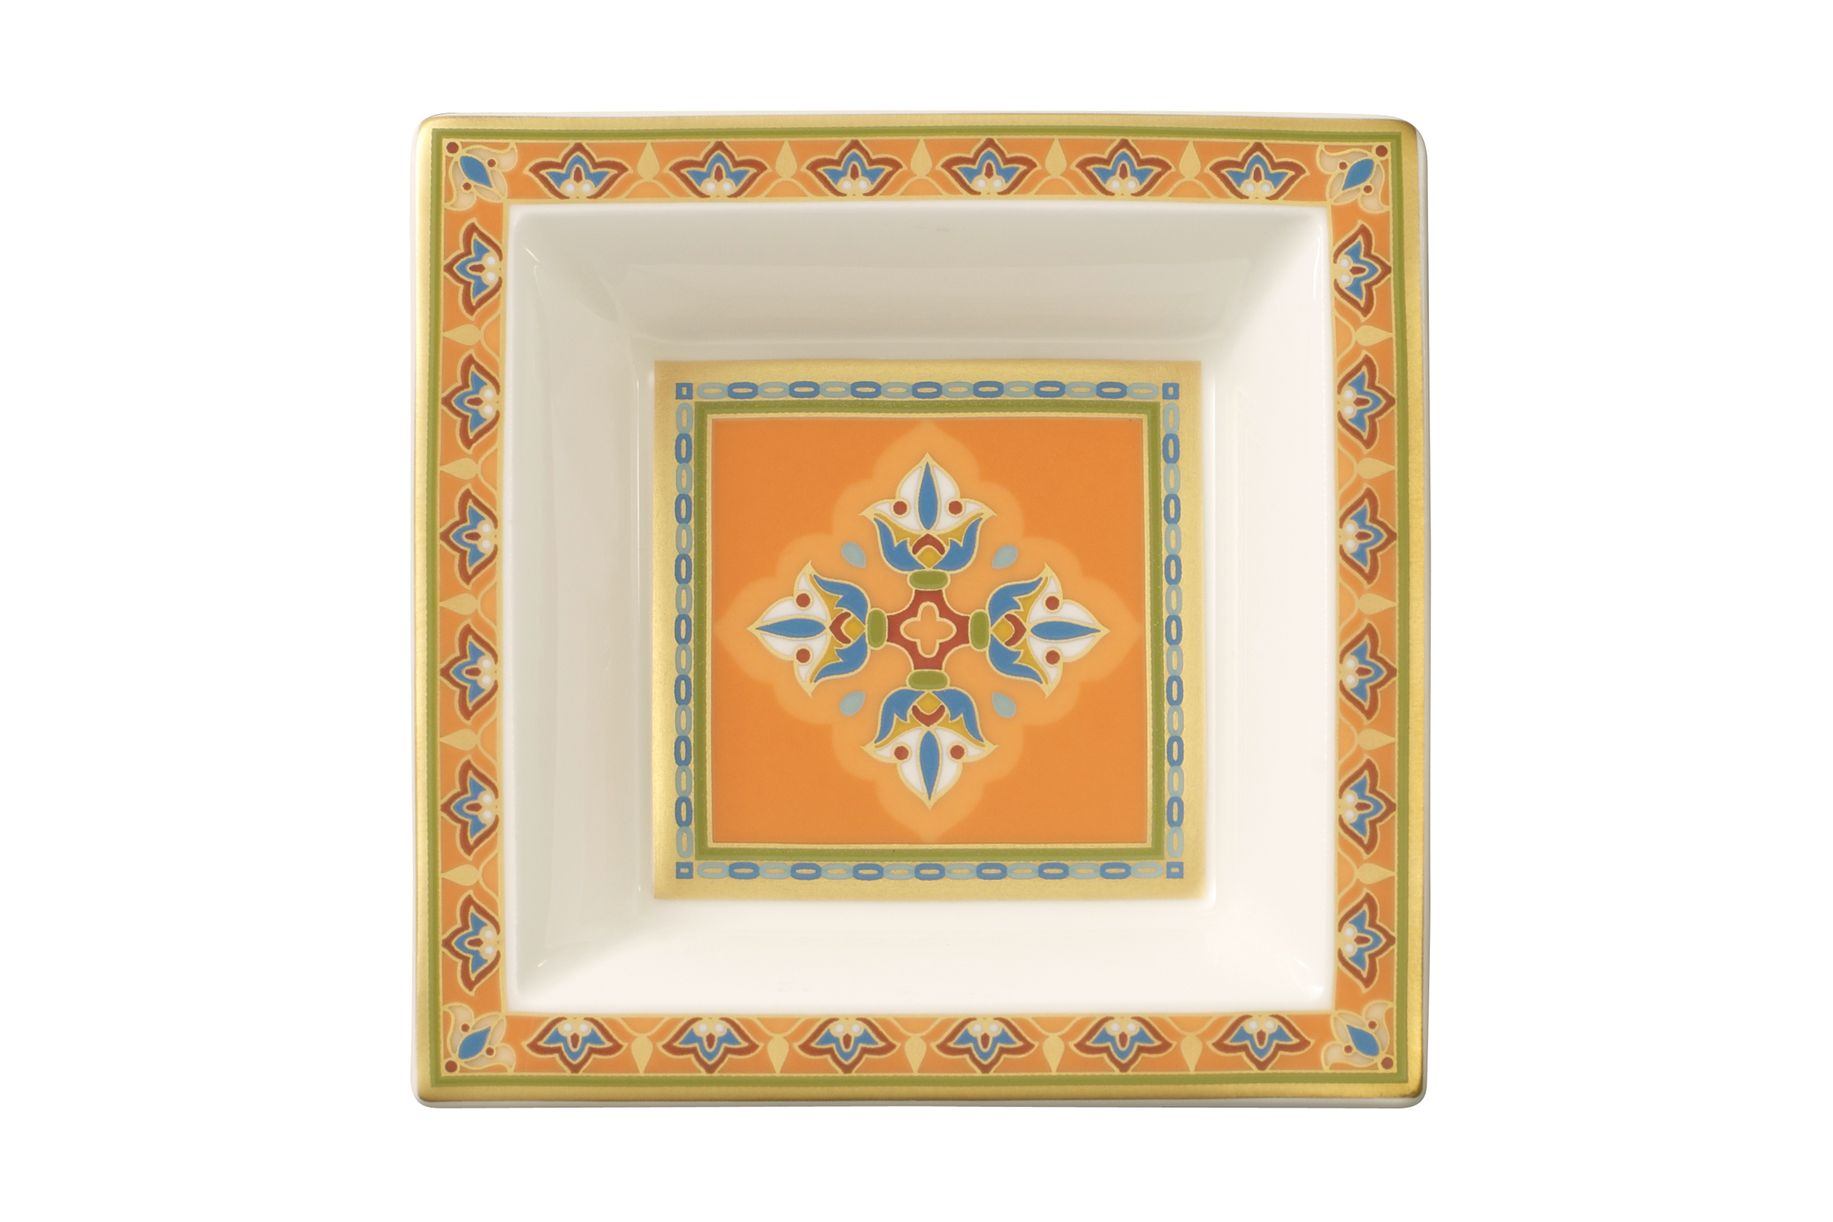 Villeroy & Boch Samarkand Dish (Giftware) Mandarin thumb 1